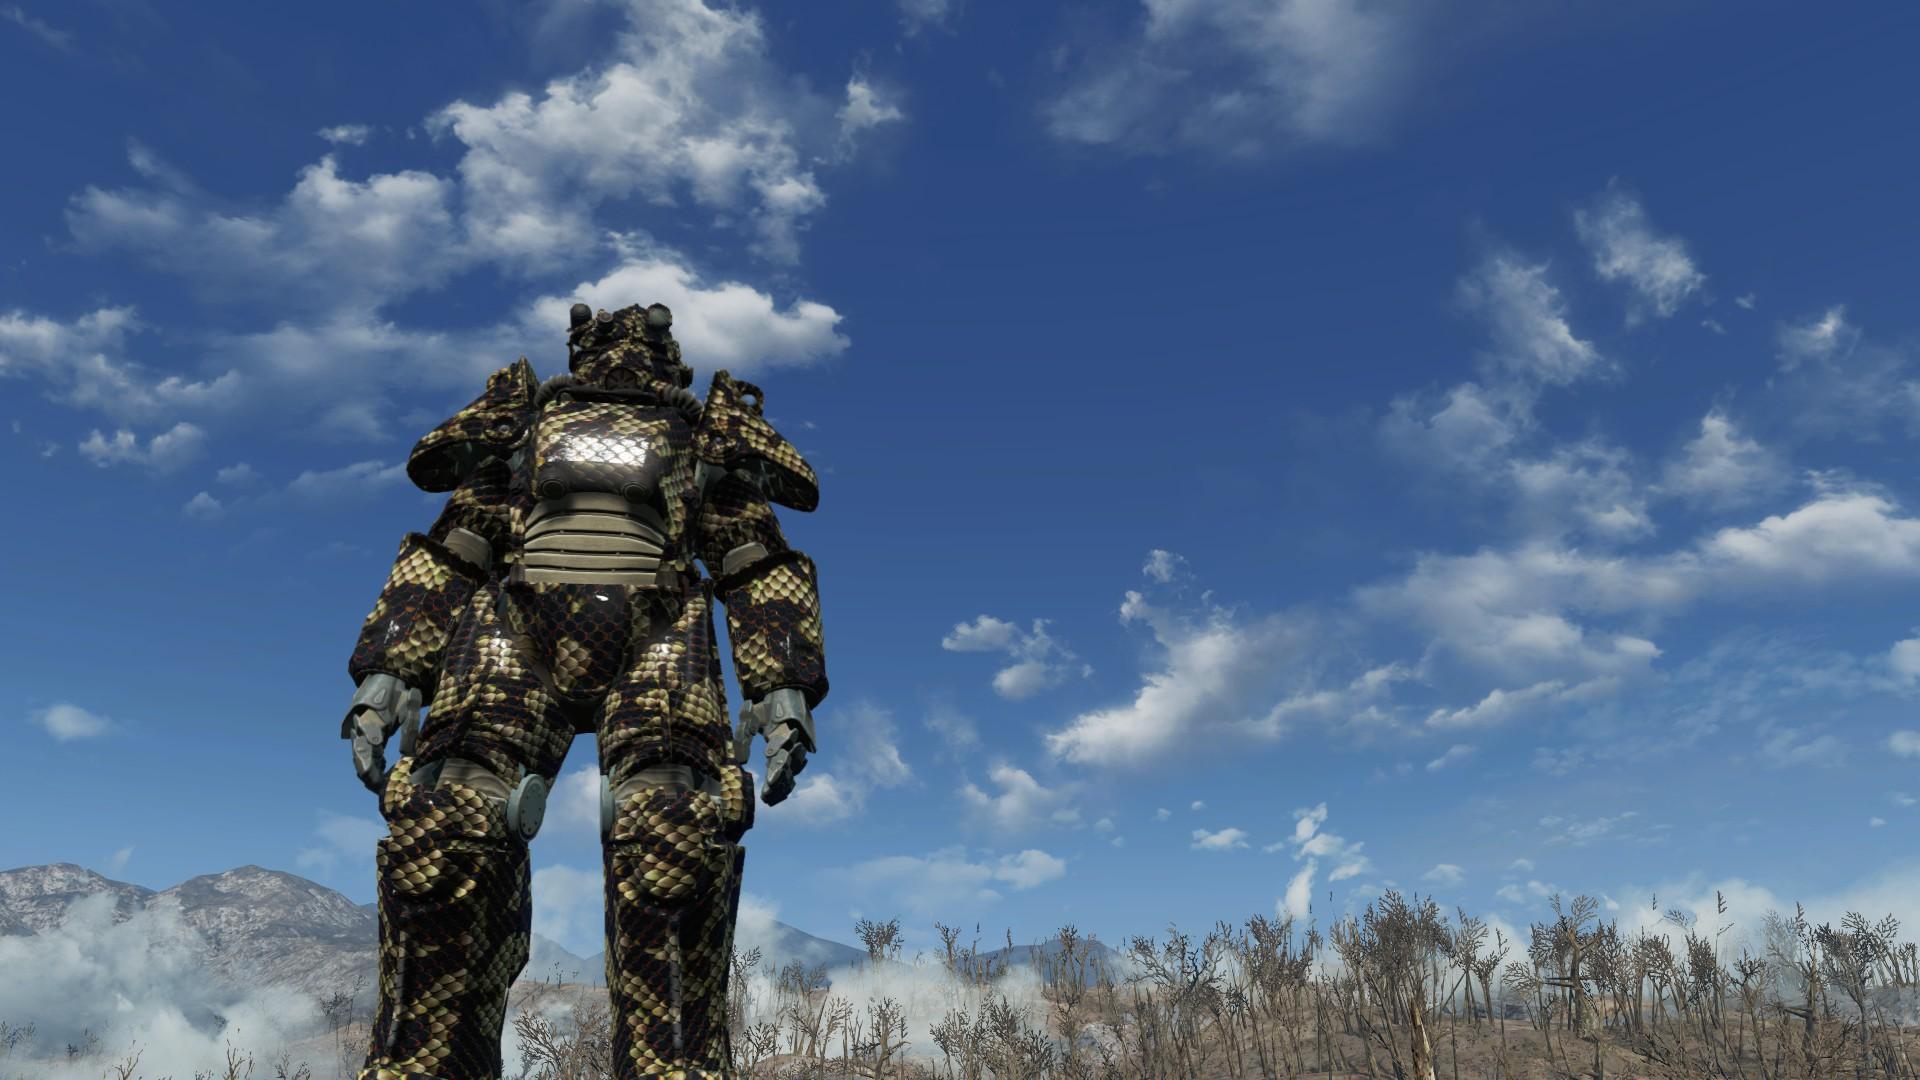 20190421124212_1.jpg - Fallout 4